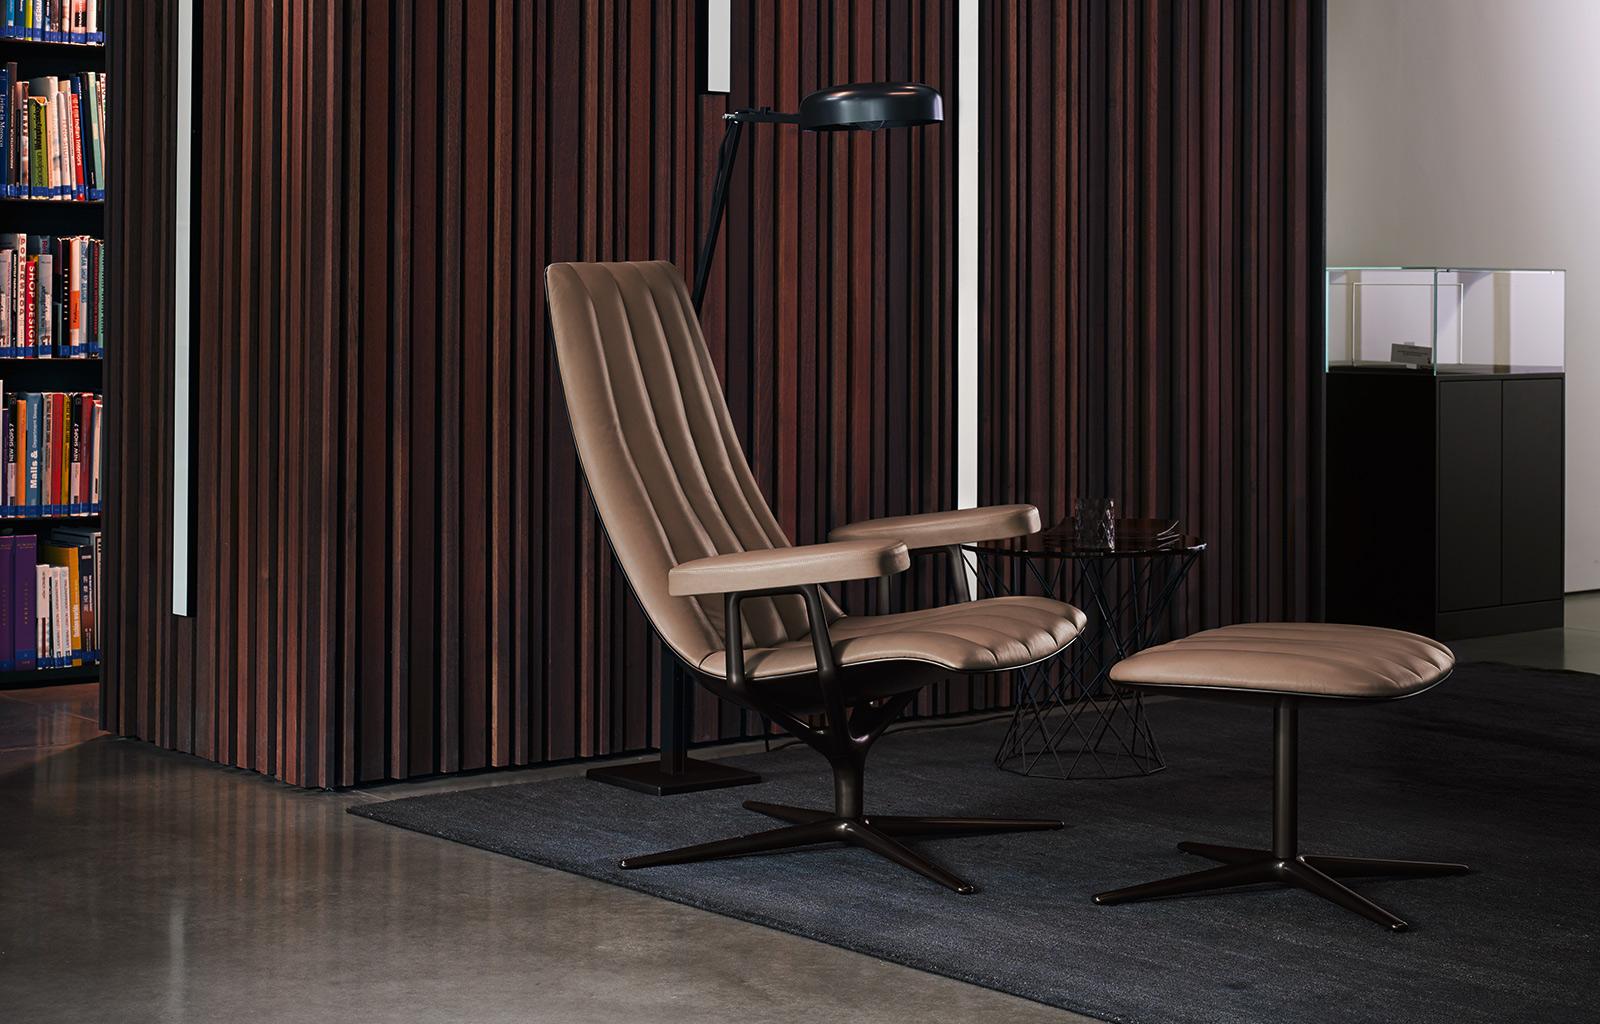 Healey Lounge By Pearson Lloyd For Walter Knoll Sohomod Blog